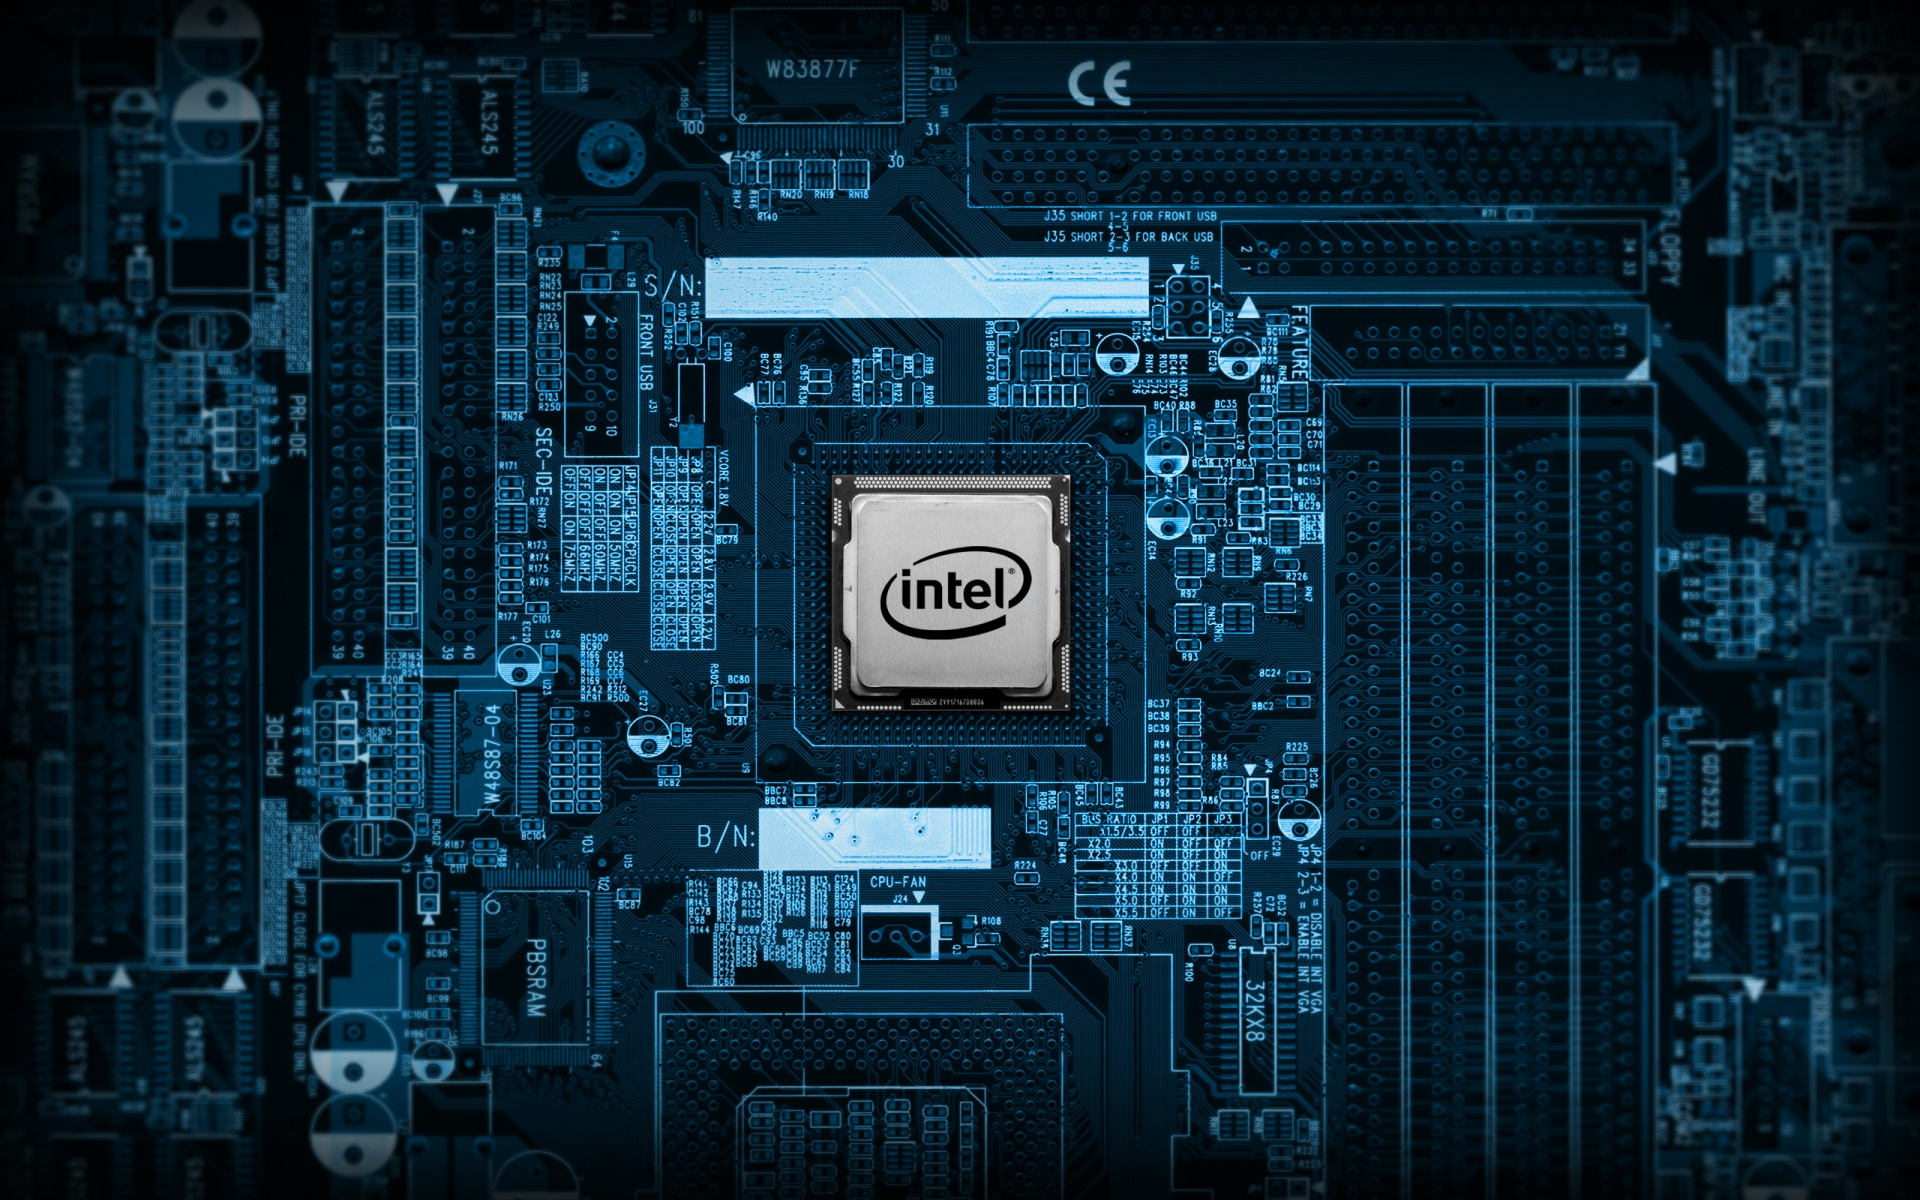 intel_chipset-1920x1200+1.jpg